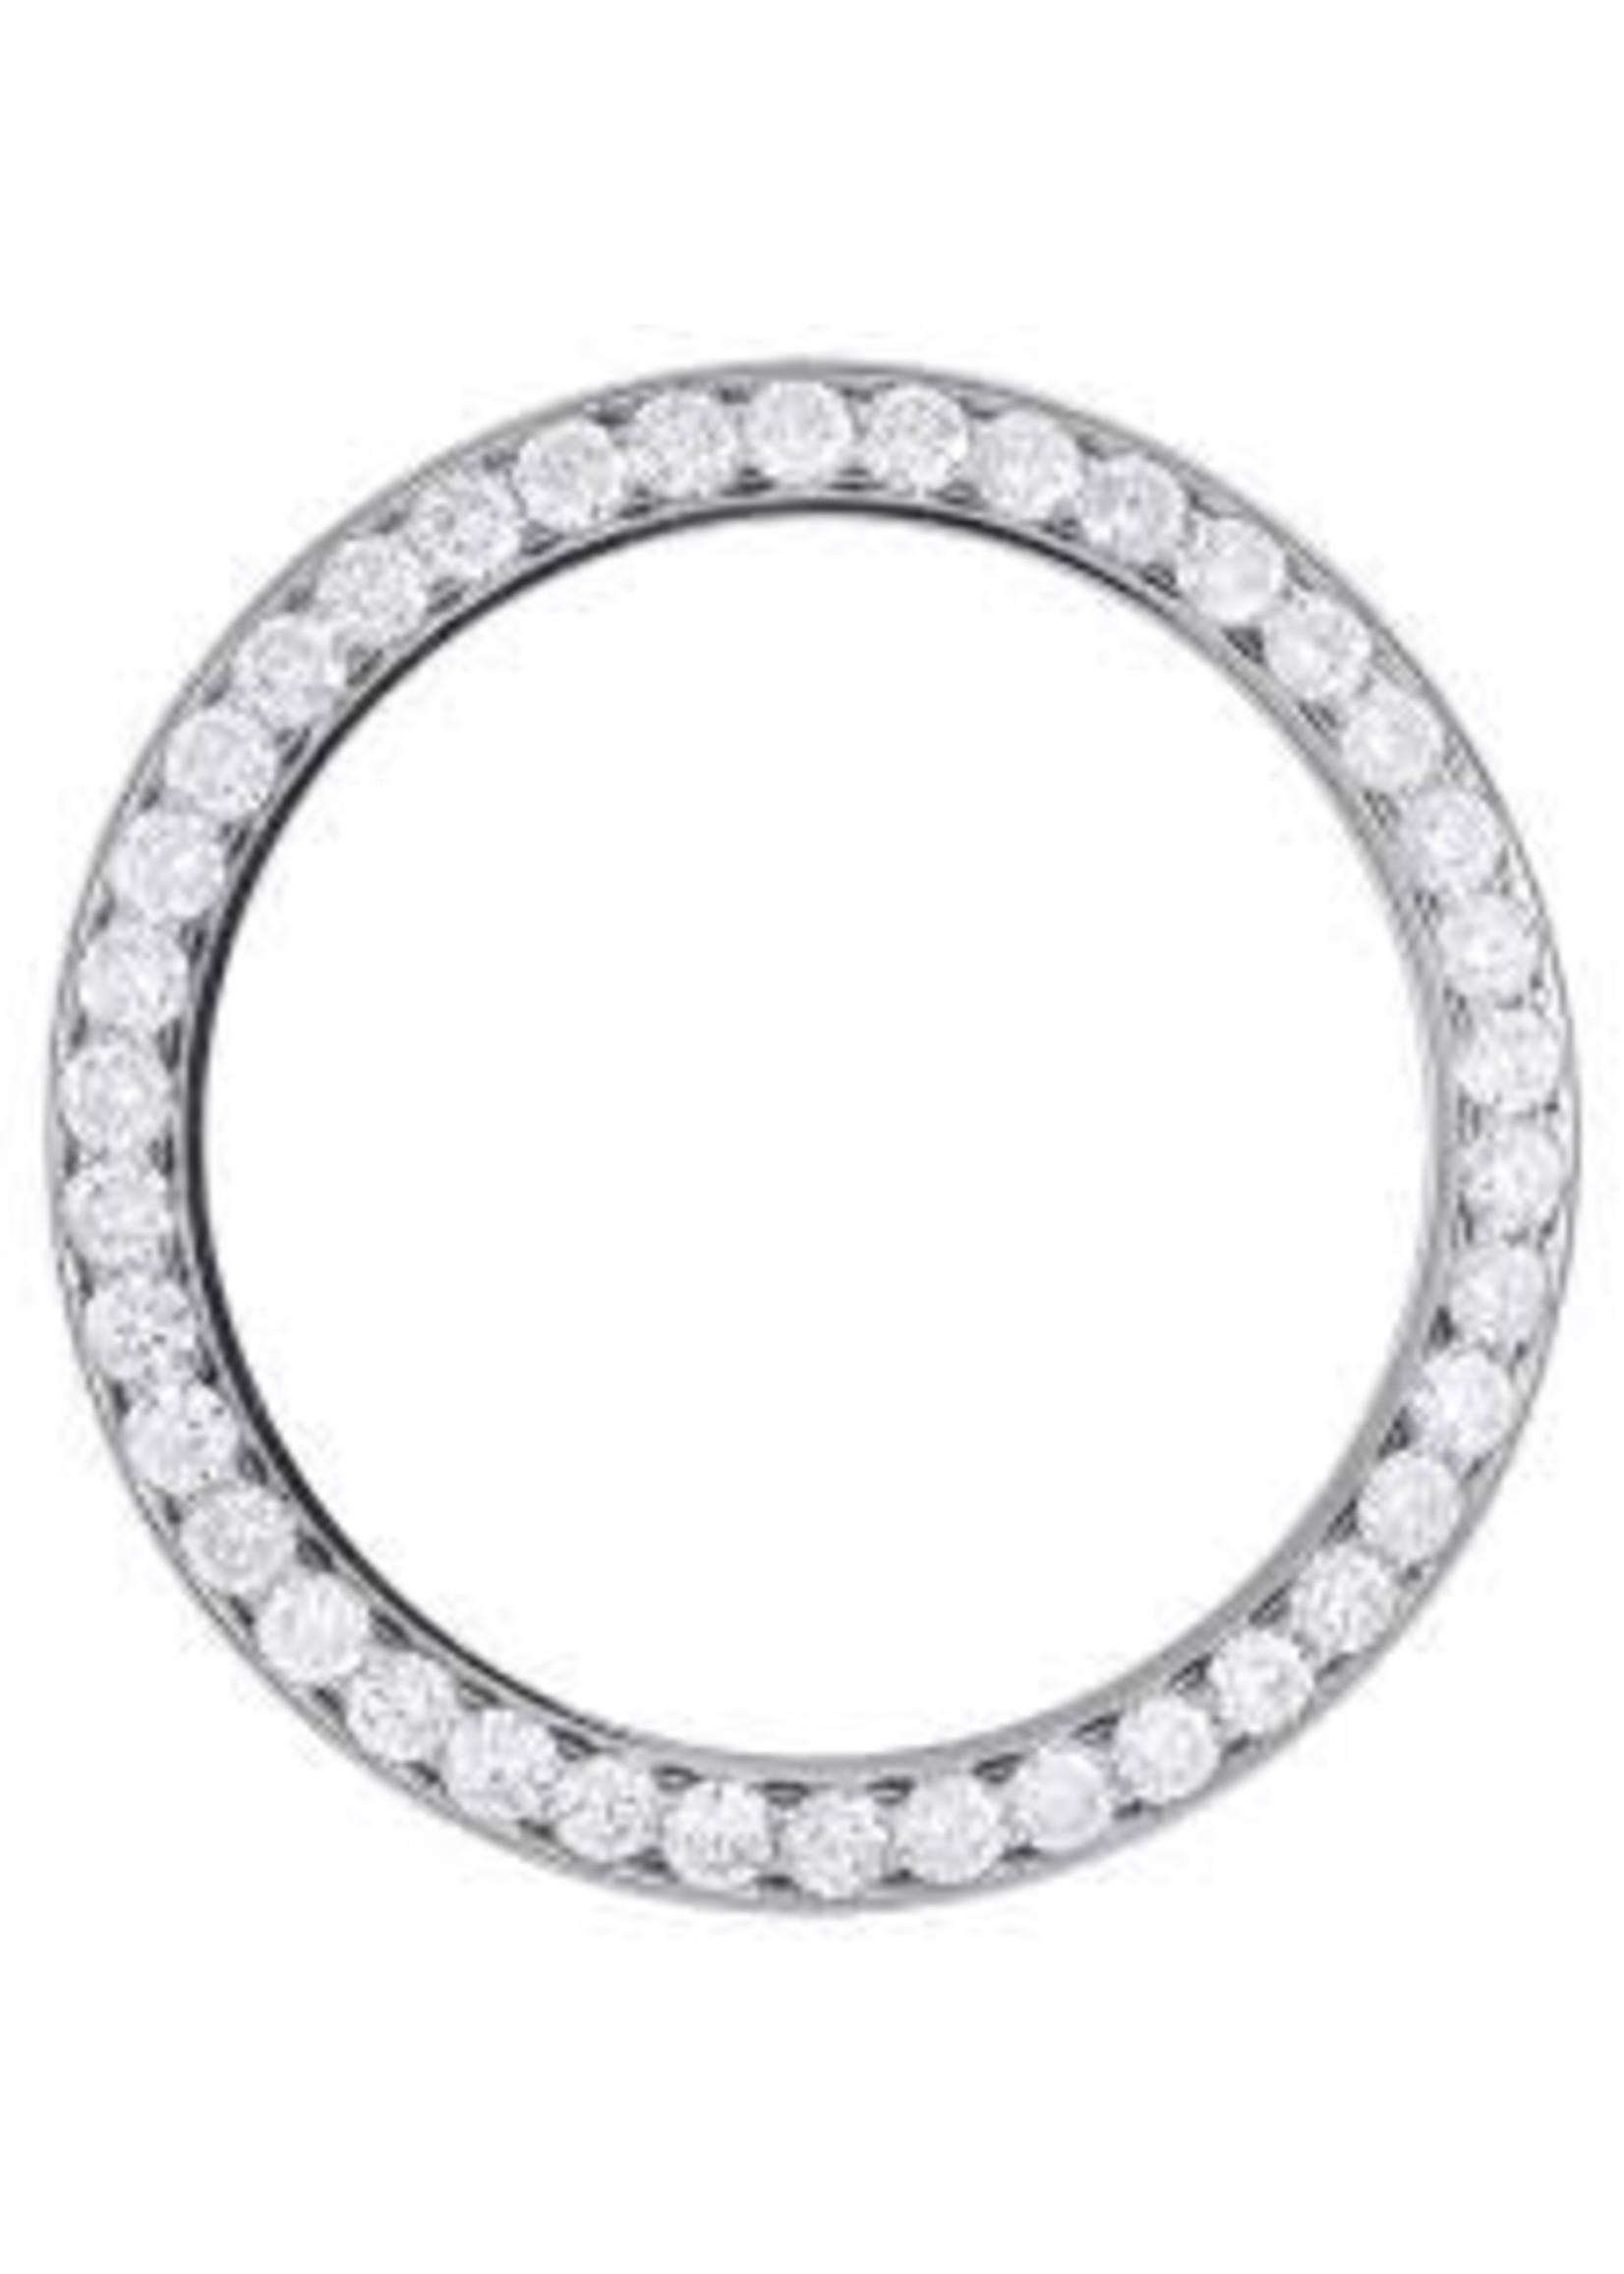 Rolex 3 Ct Diamond Bezel For Rolex Datejust II 41mm ( Steel